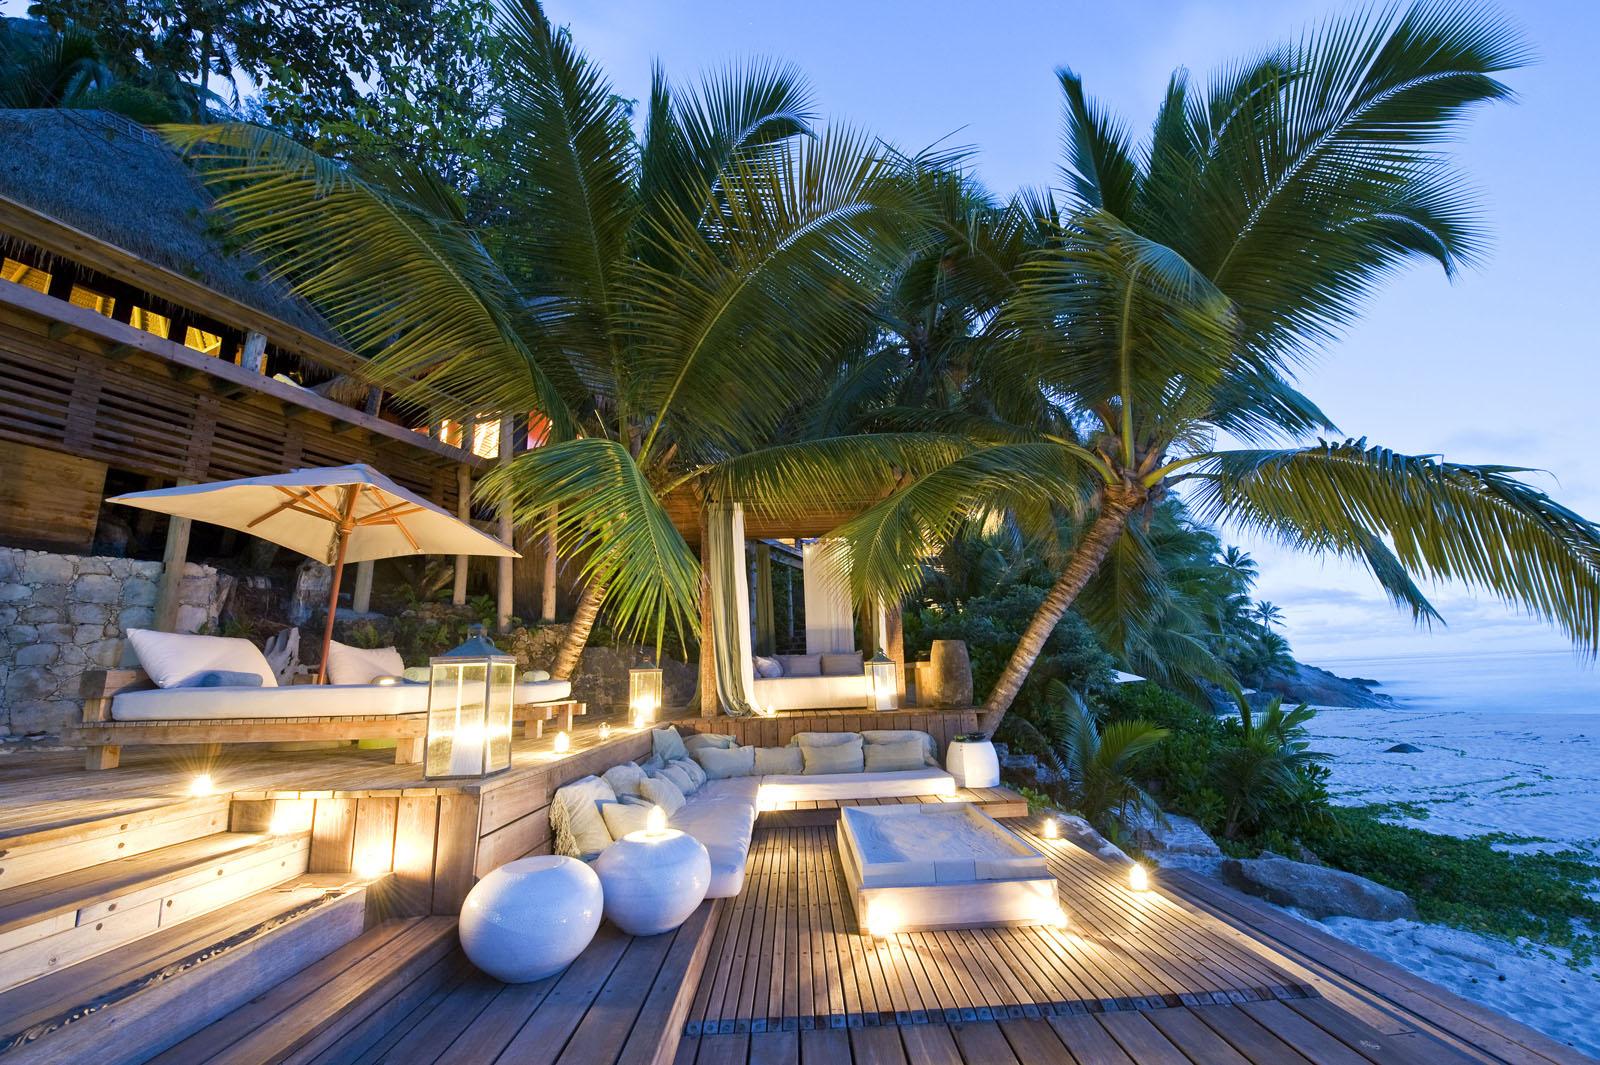 North-Island-Resort-Seychelles_1.jpg